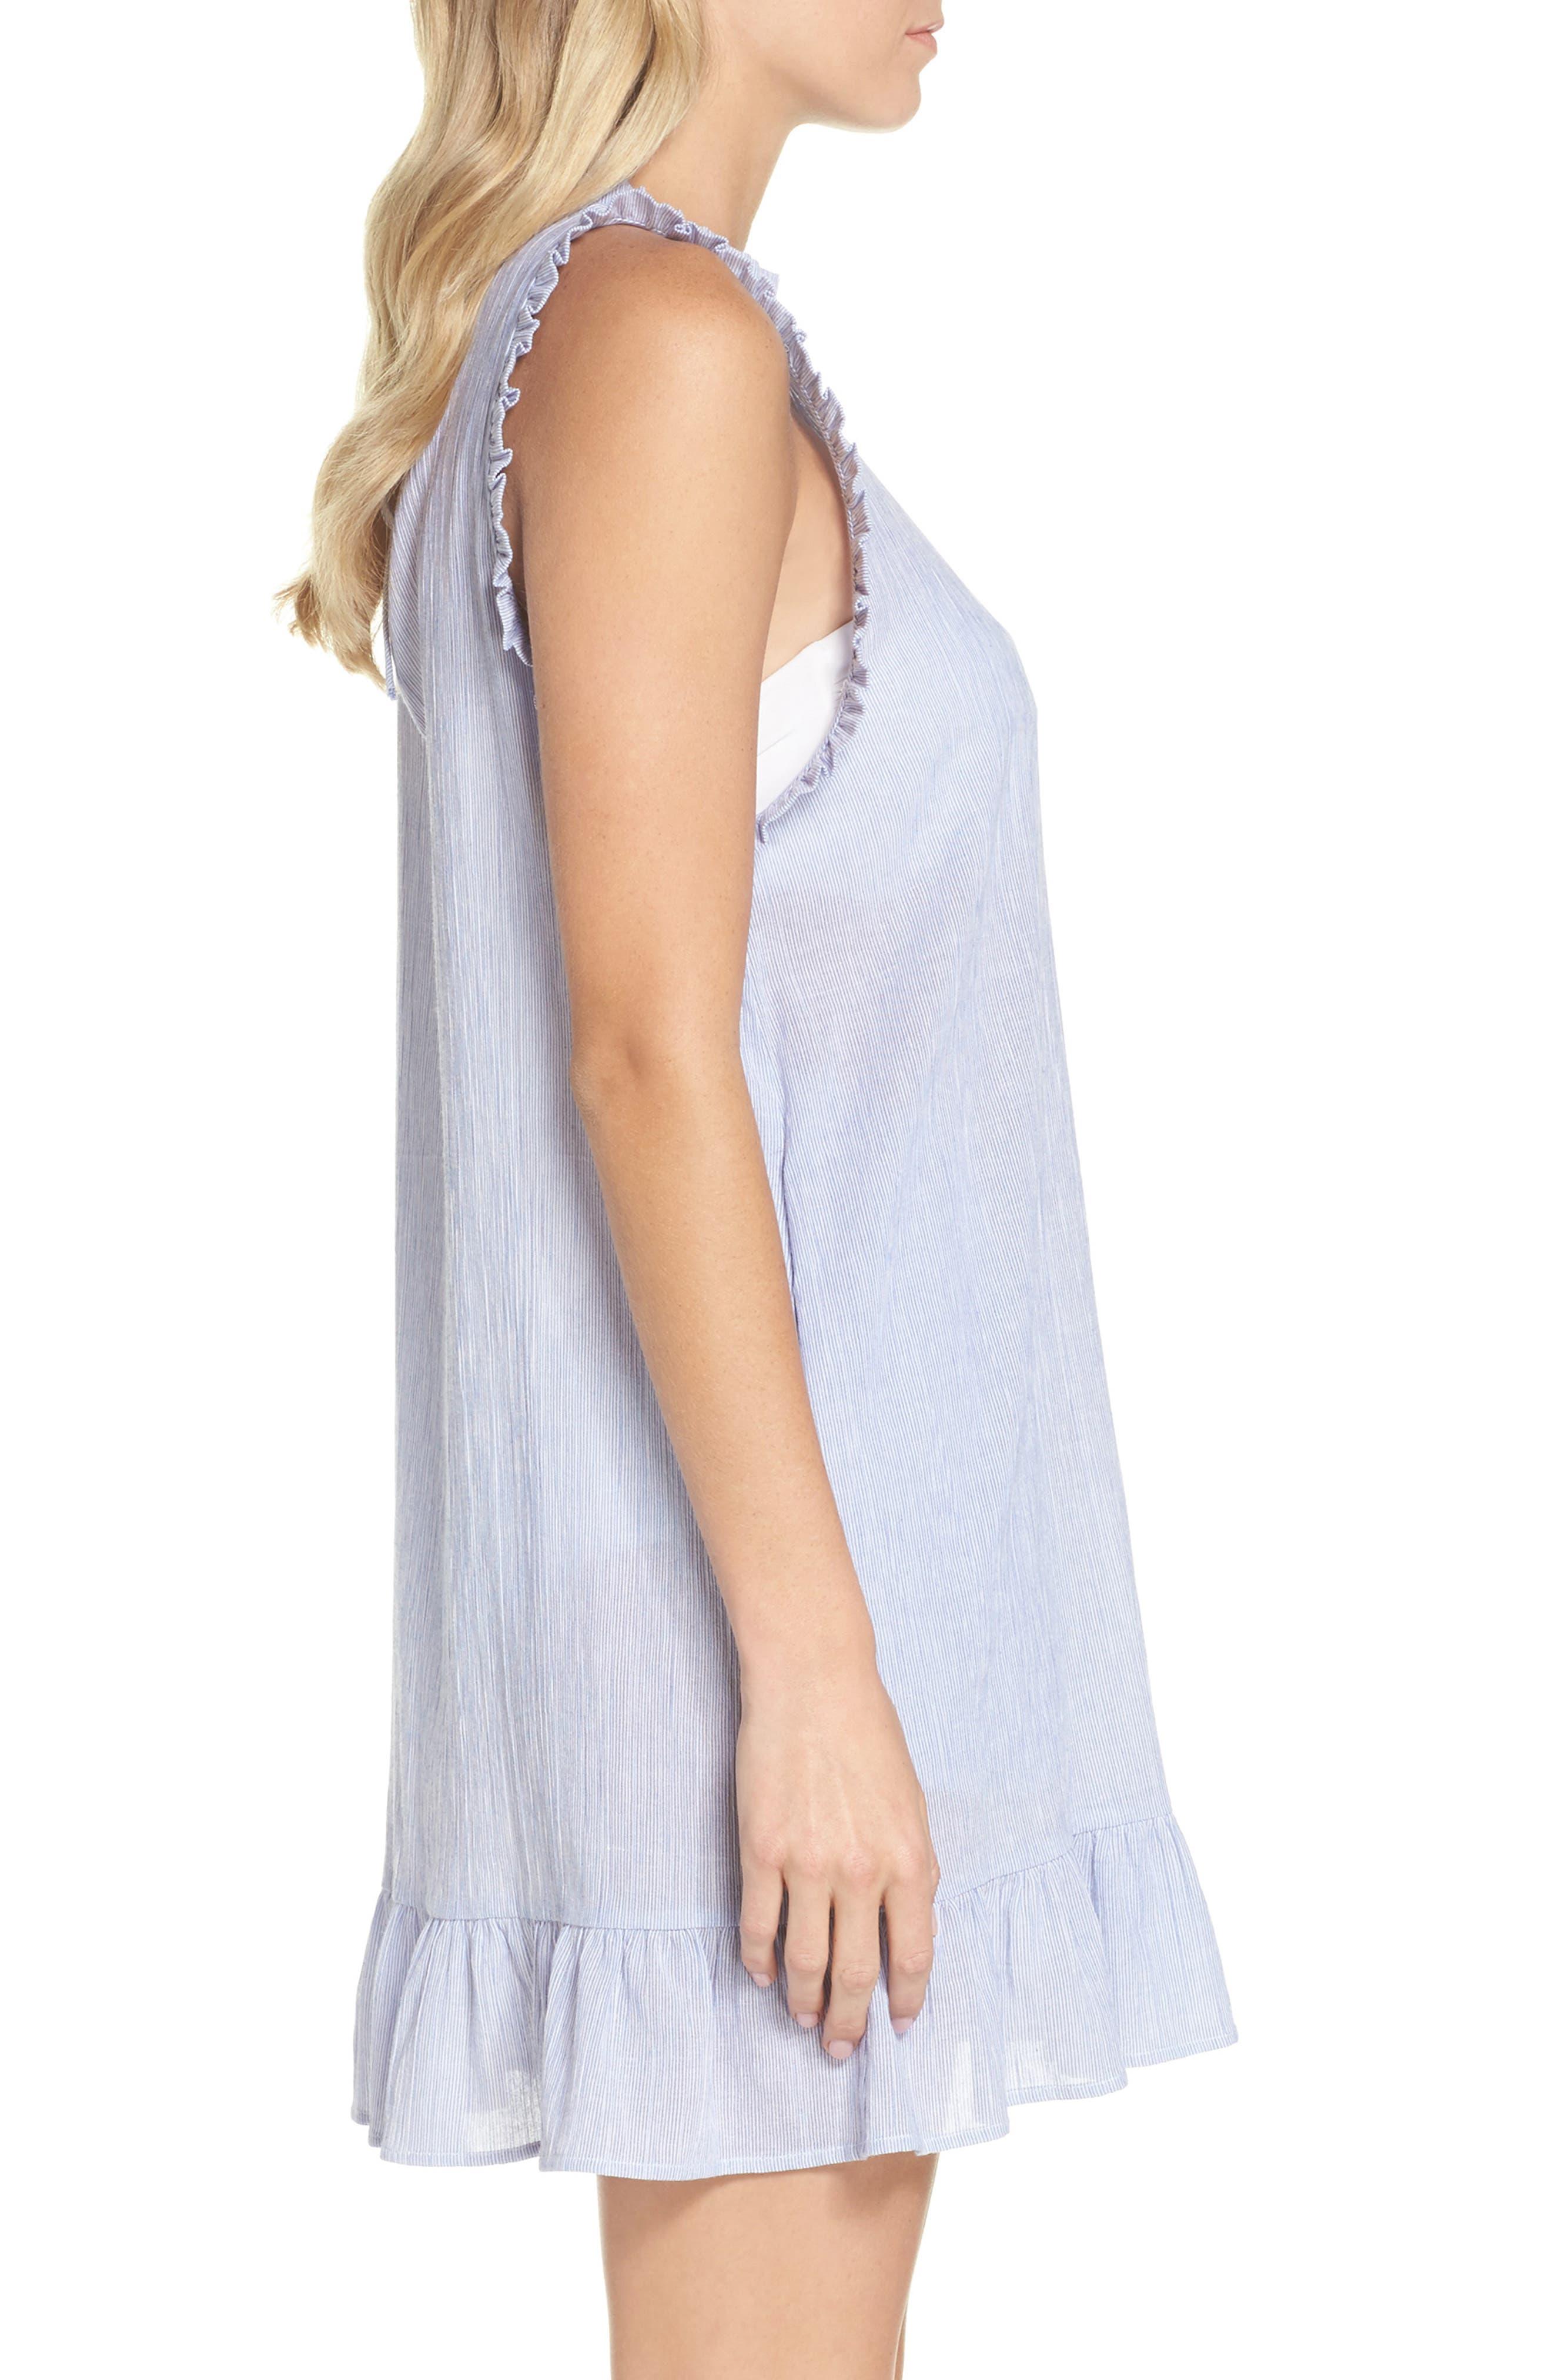 Heidi Cover-Up Dress,                             Alternate thumbnail 3, color,                             Blue/ White